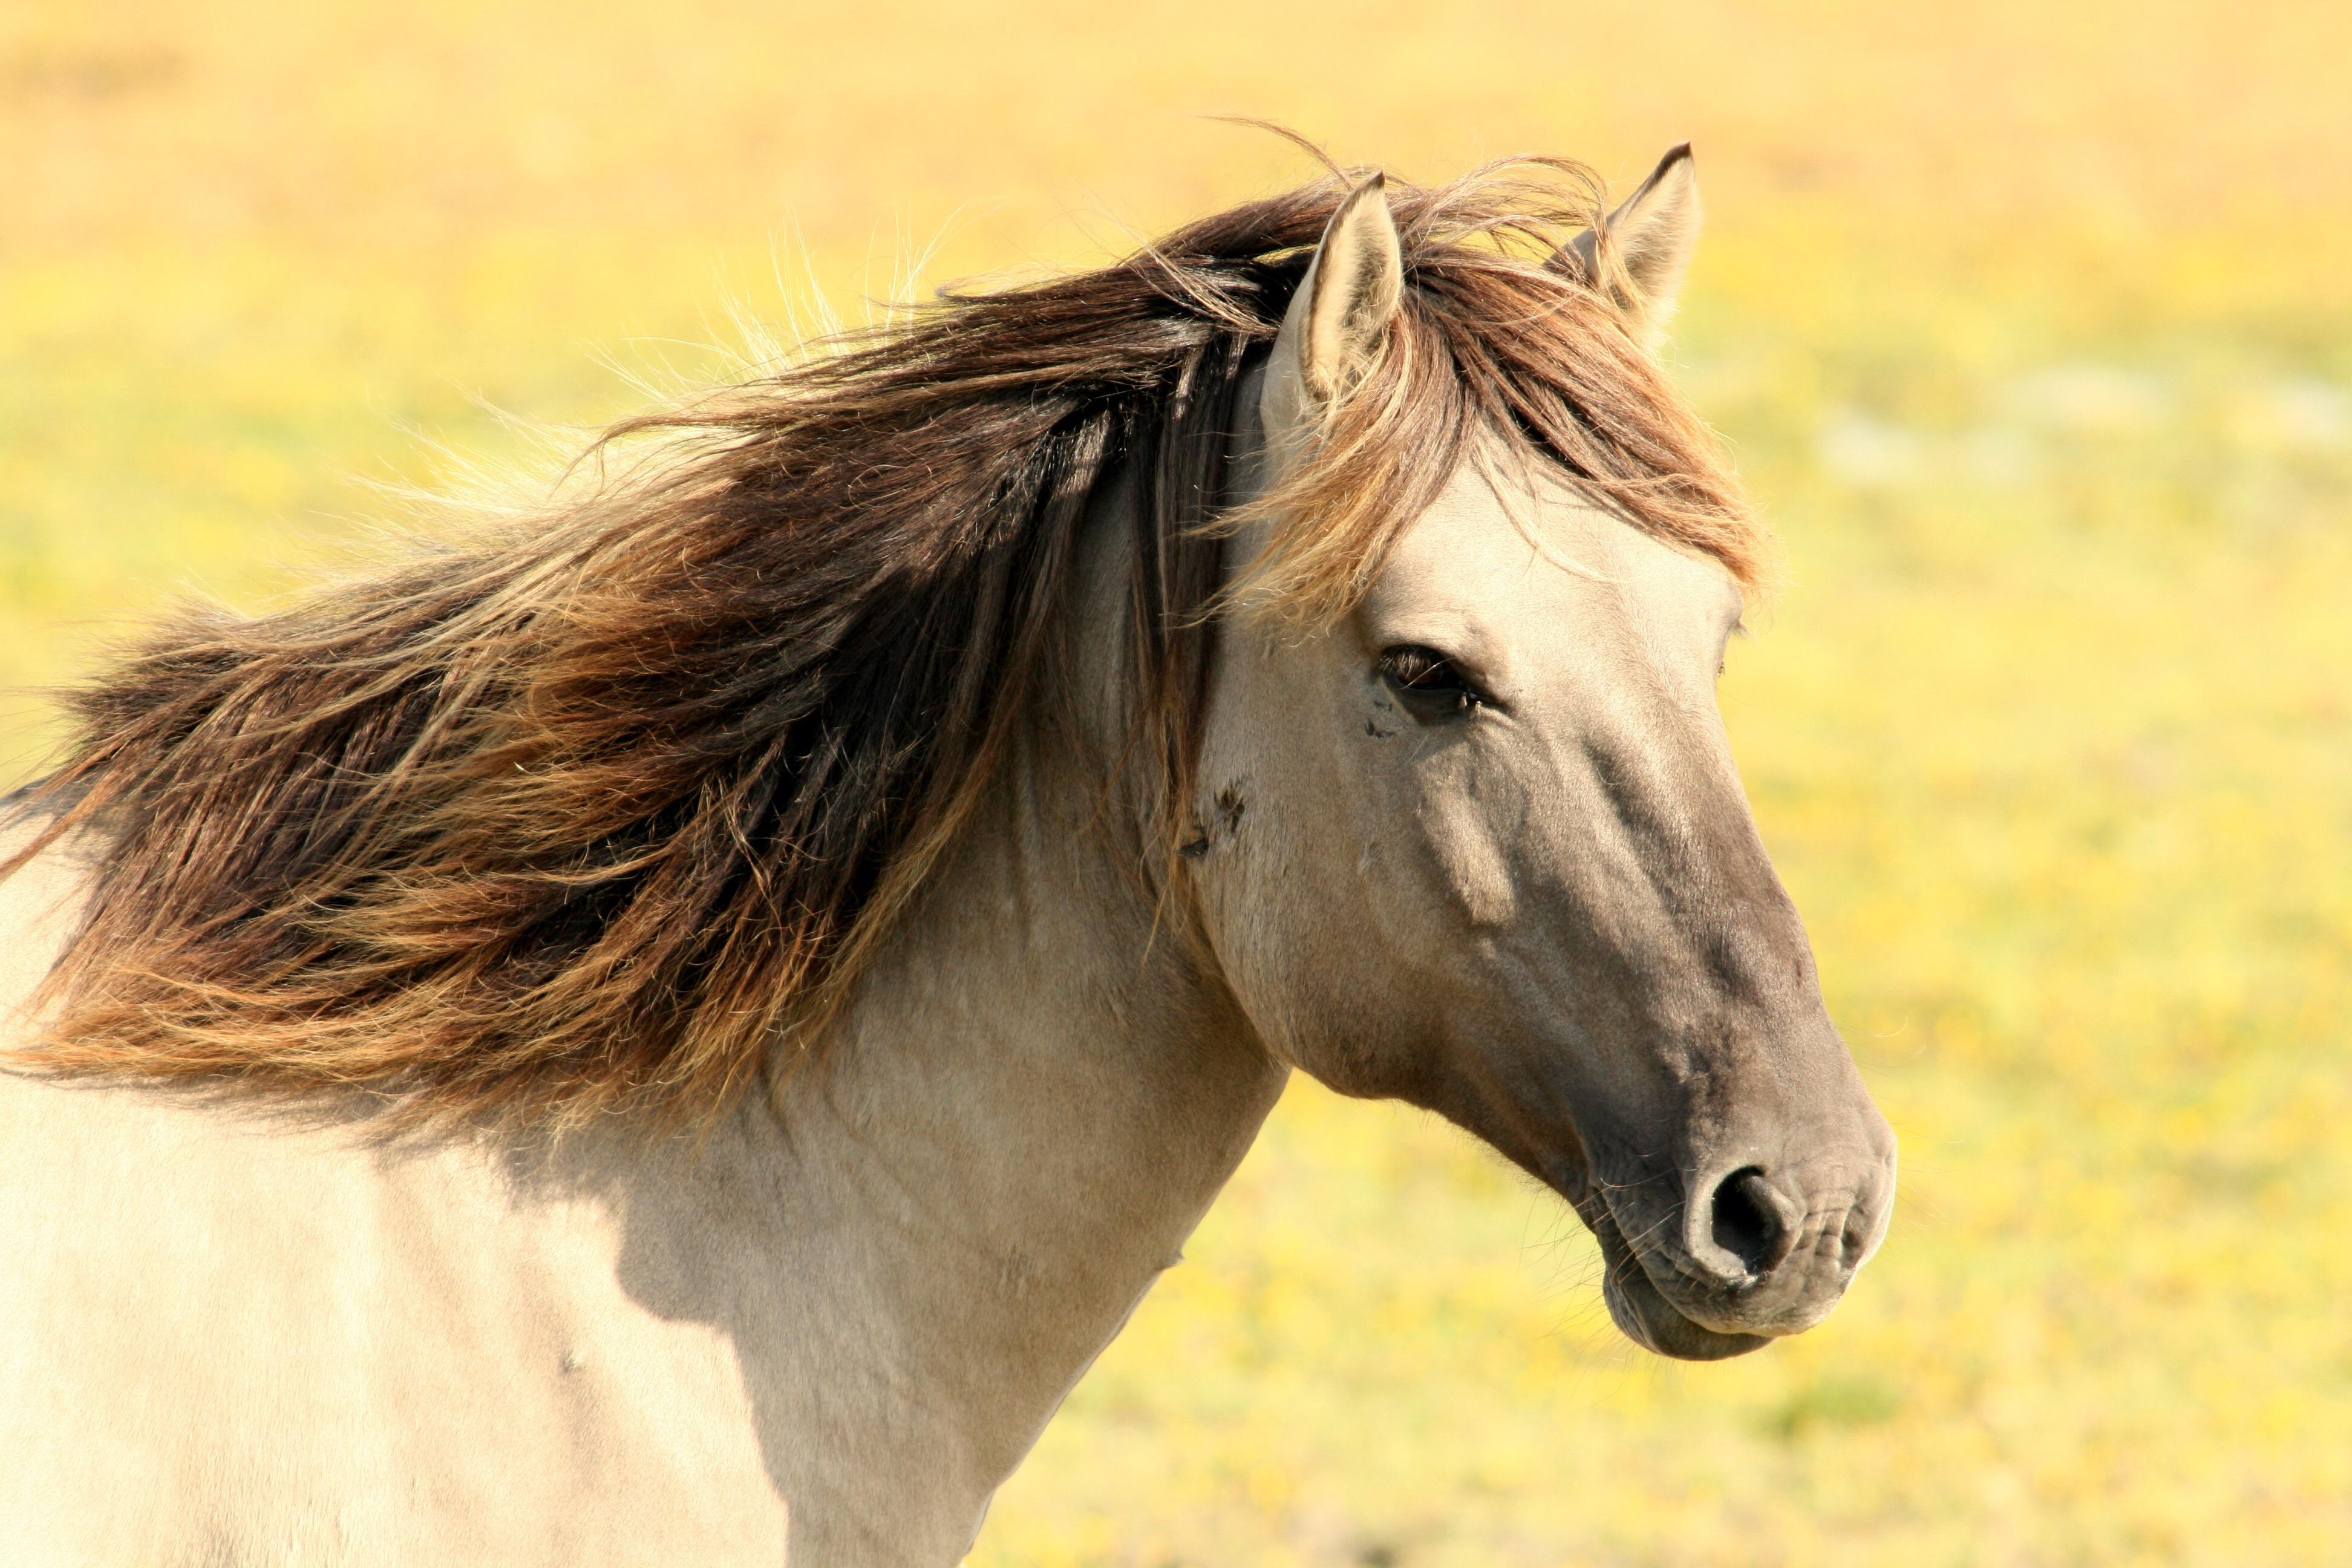 free images : nature, pasture, stallion, mane, fauna, close up